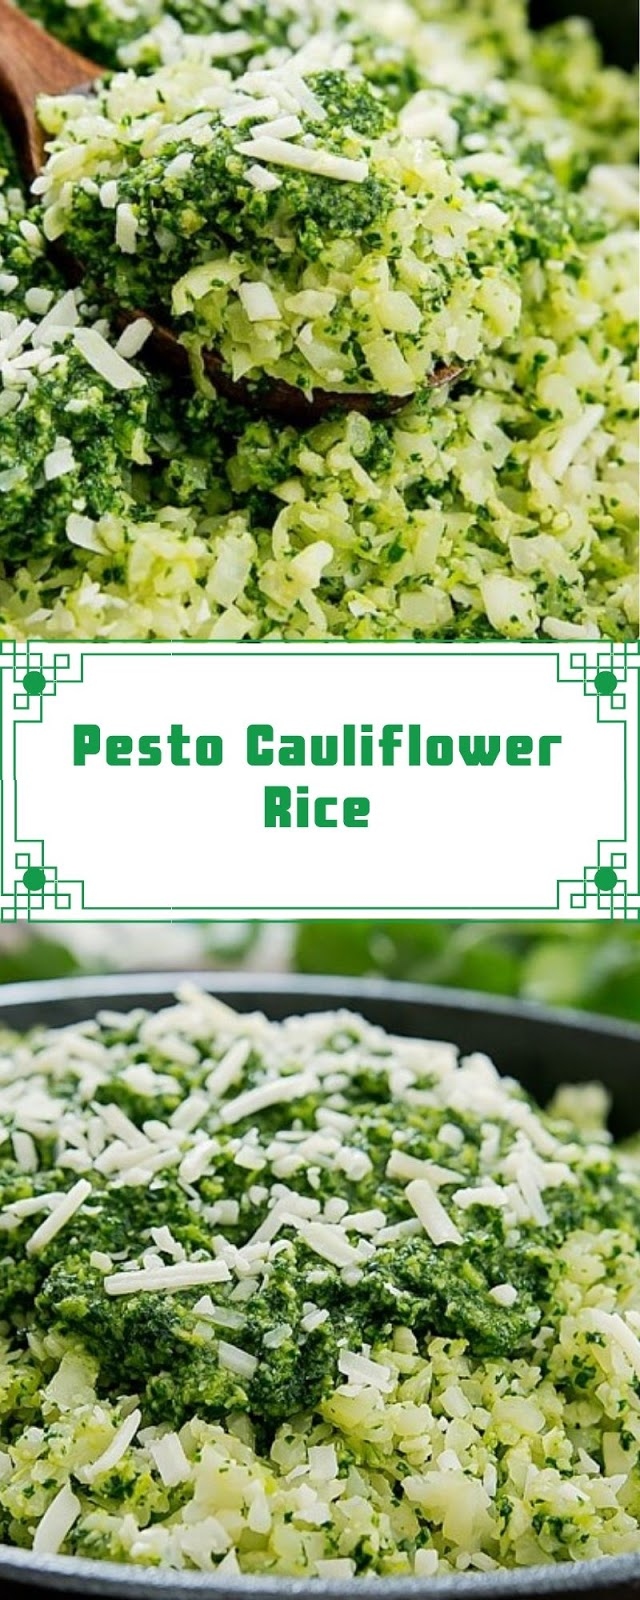 Pesto Cauliflower Rice